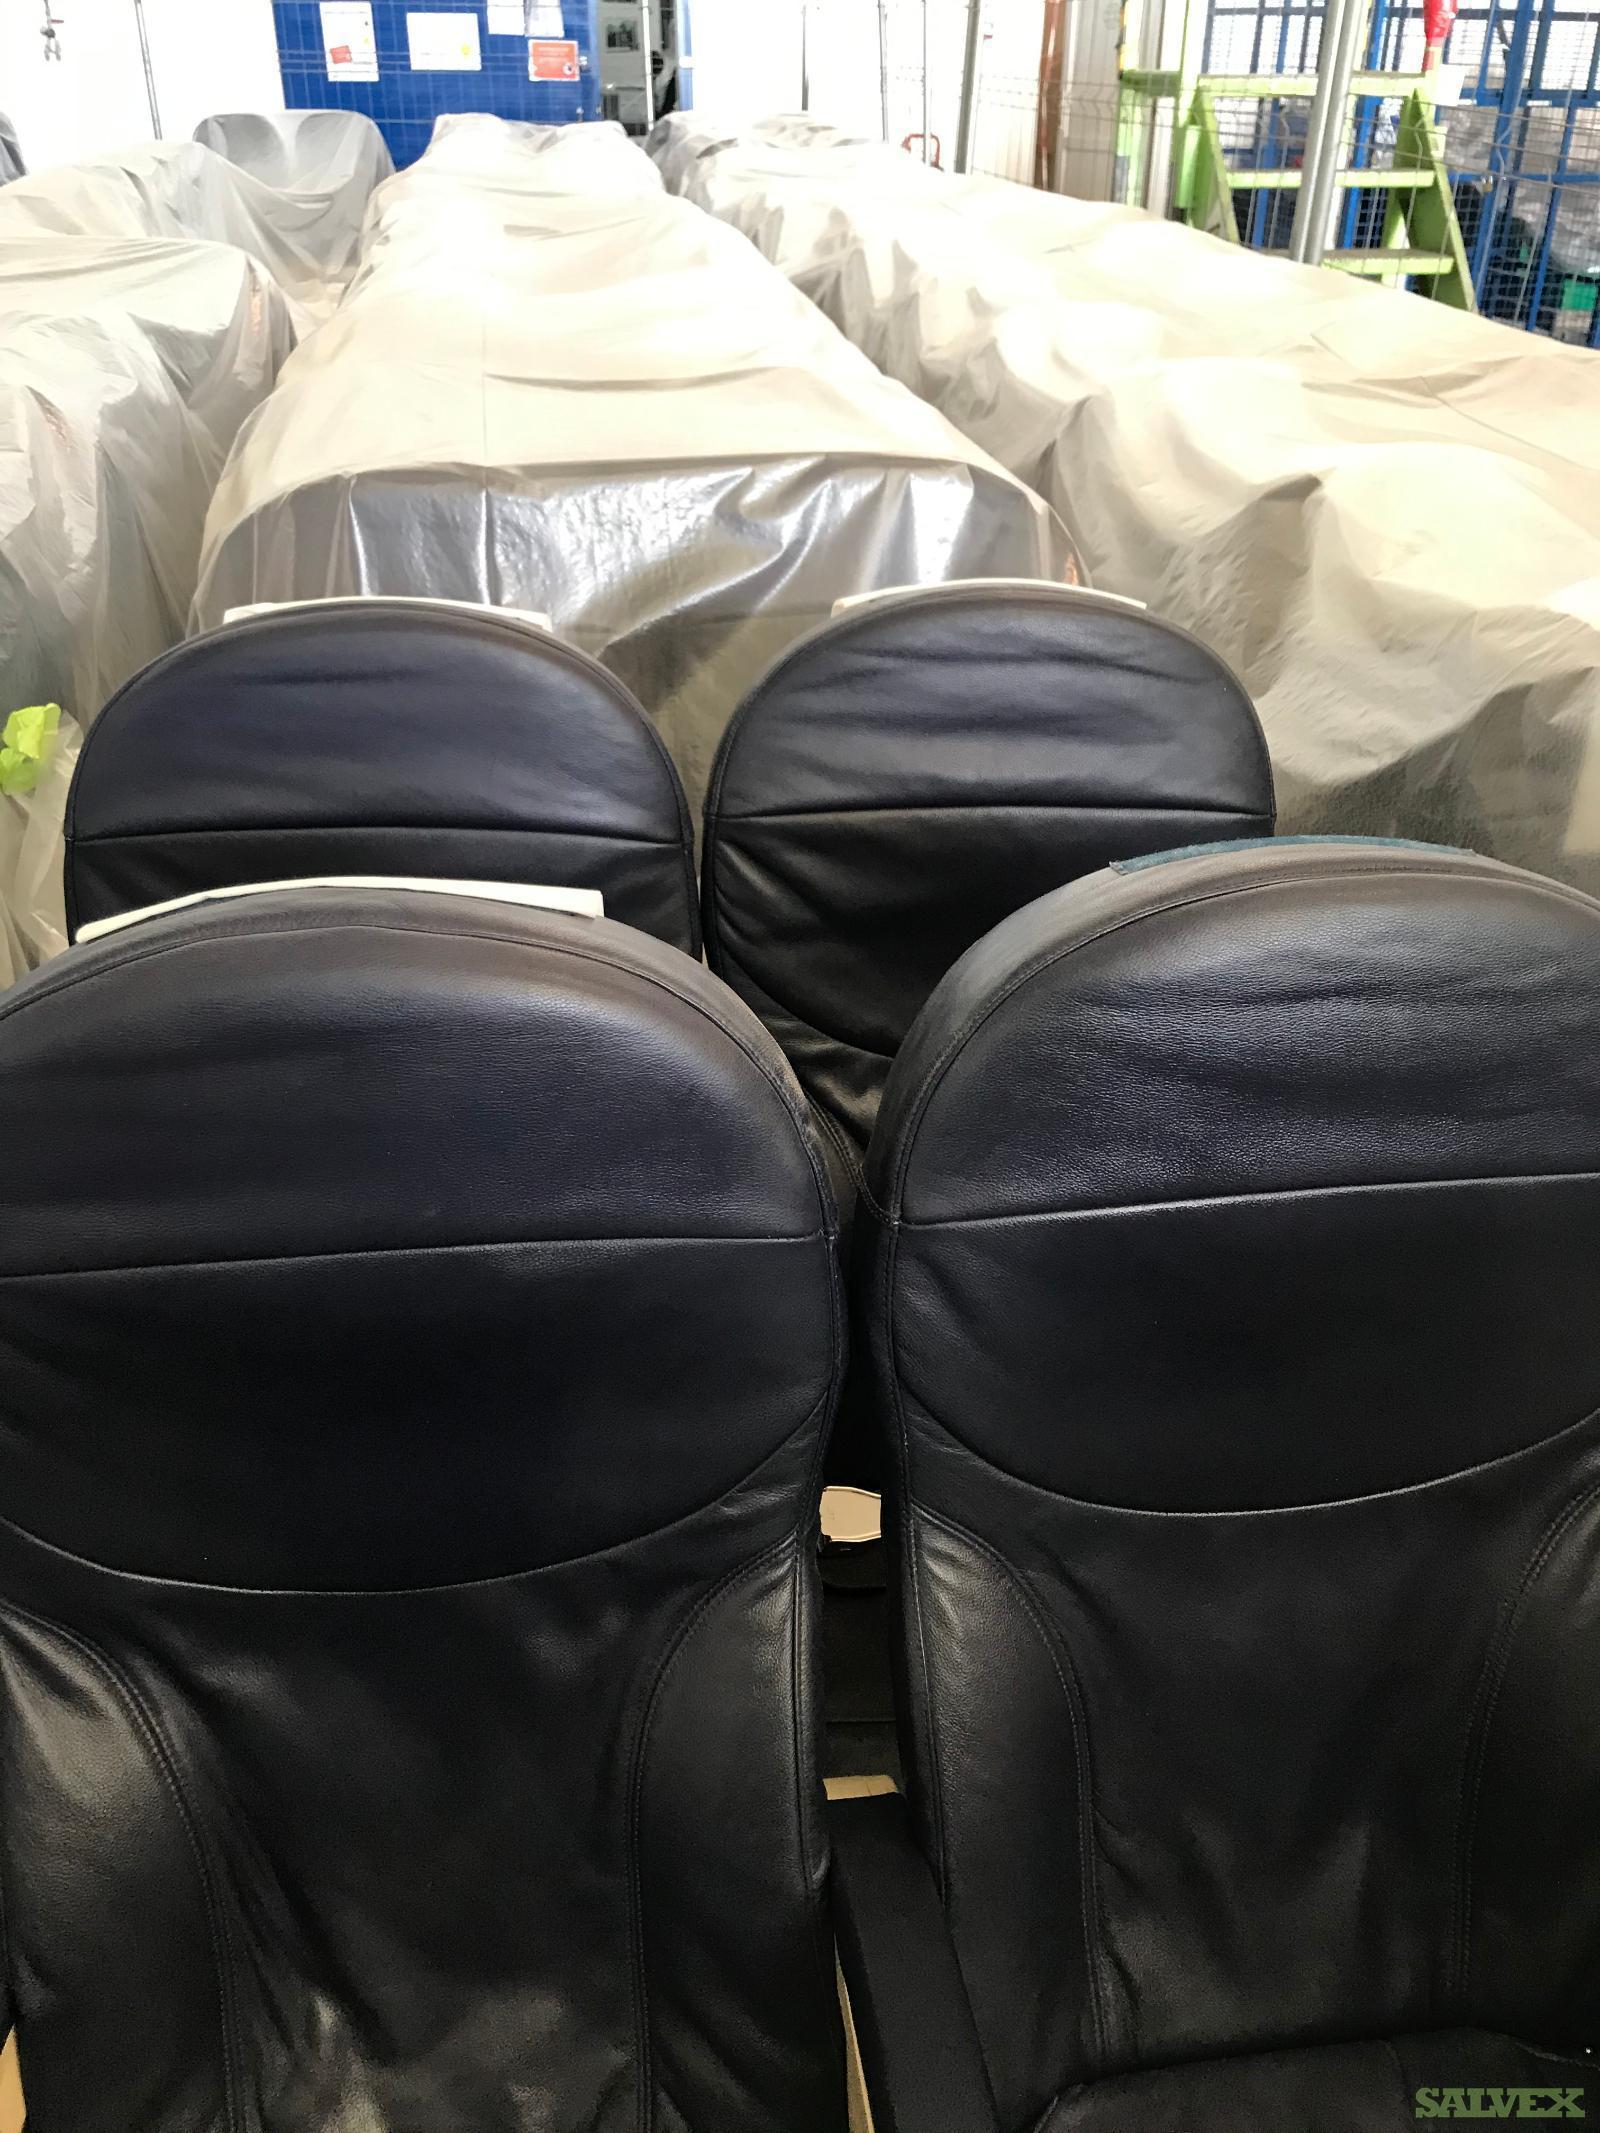 Aircraft Passenger Seats (38 Seats)